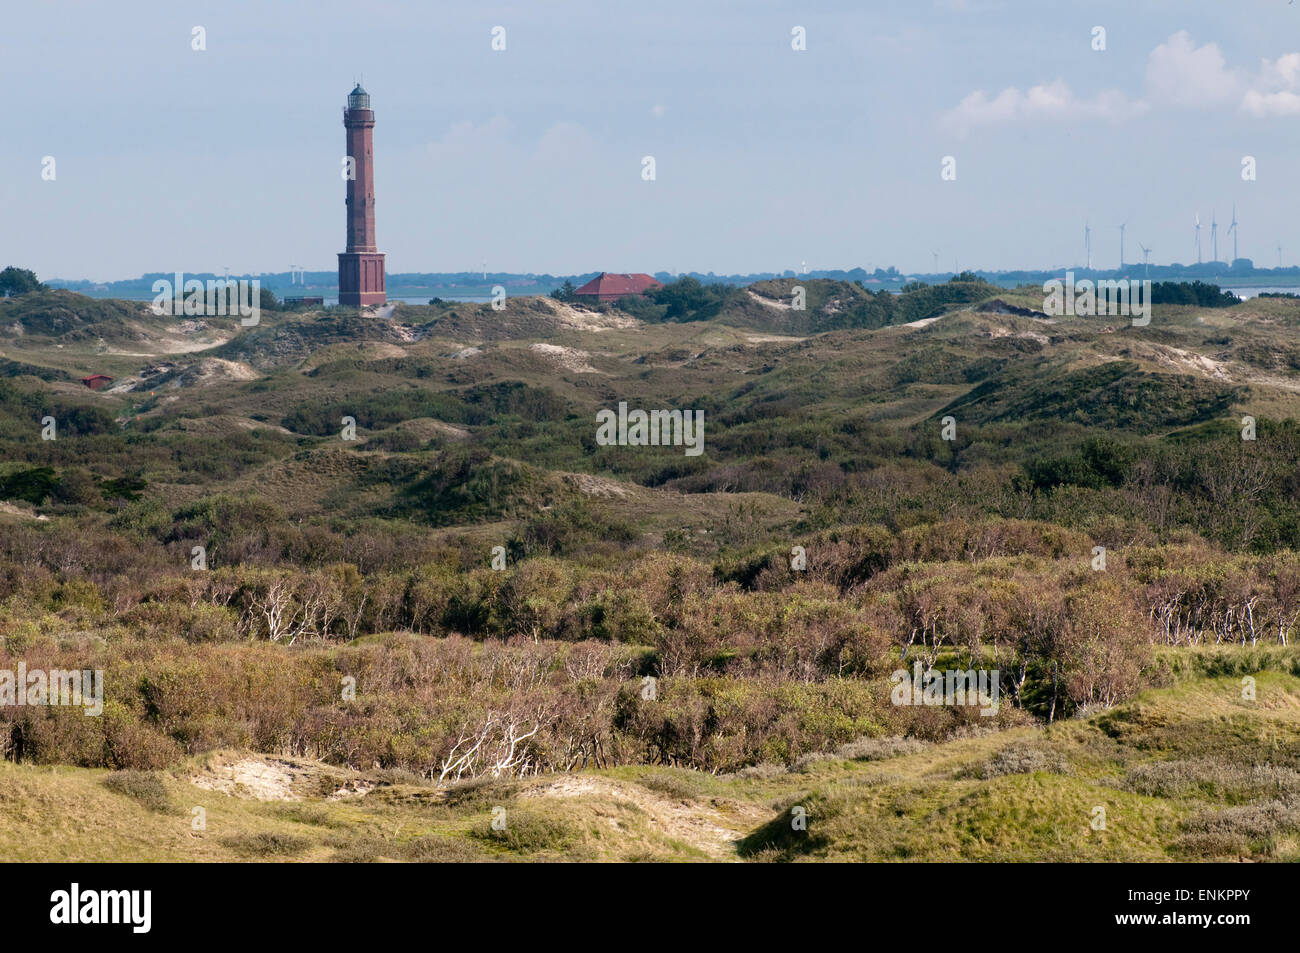 ight house, dunes, Norderney, North Sea island, Ostfriesland, Lower Saxony, Germany Stock Photo